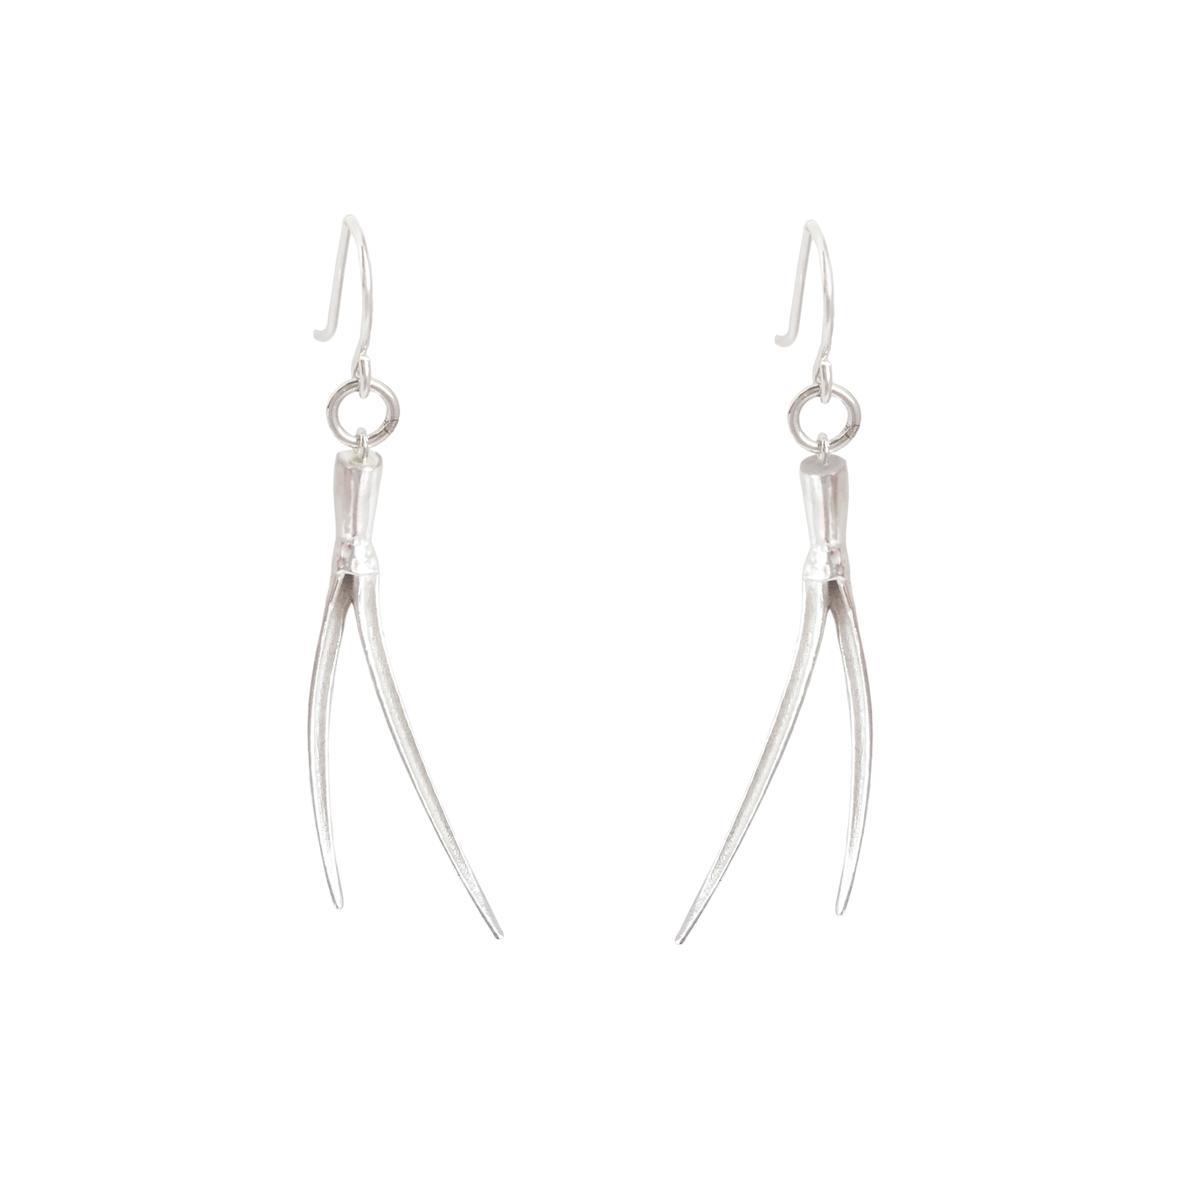 delicate sustainable spike hook earrings in sterling silver